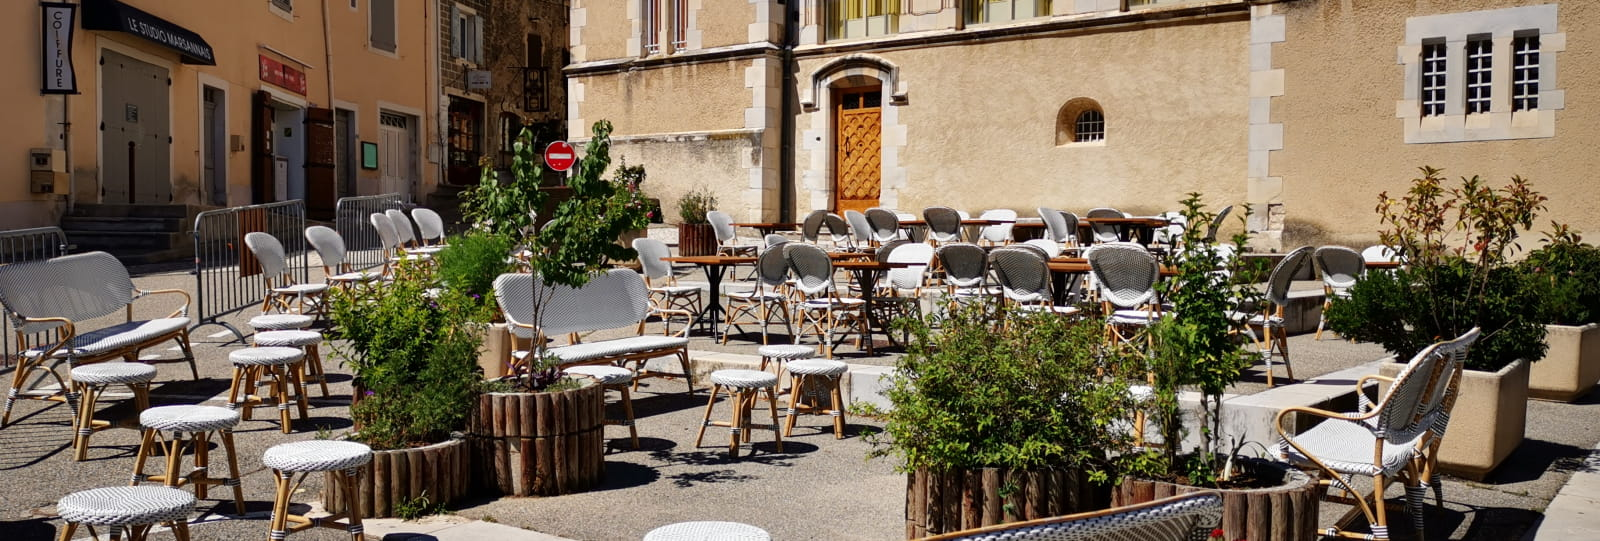 Restaurant Le Vin Juin